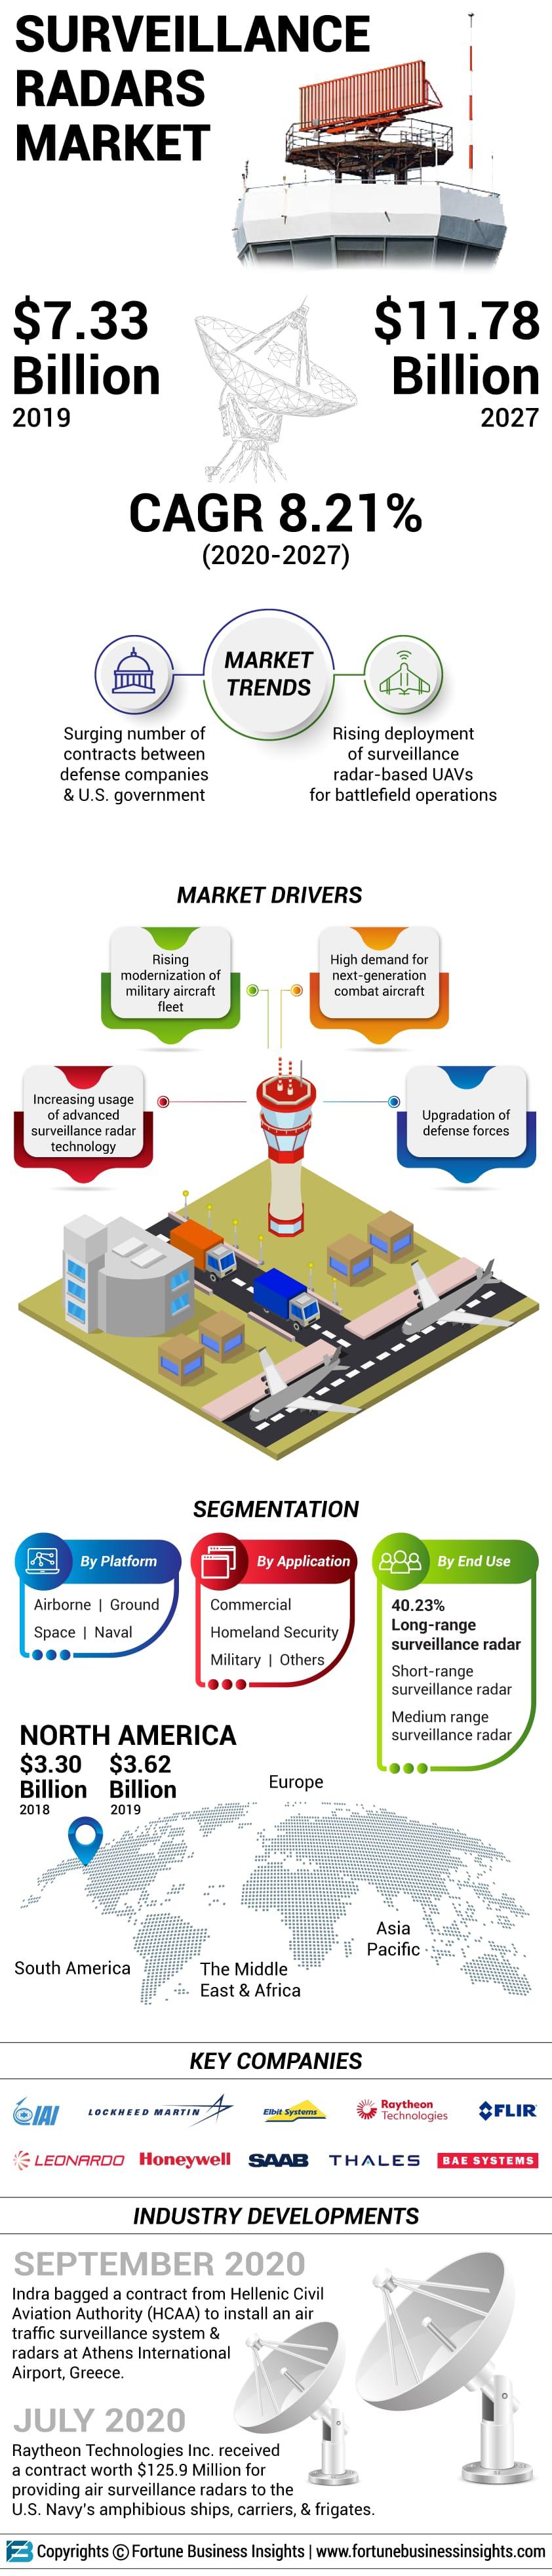 Surveillance Radars Market